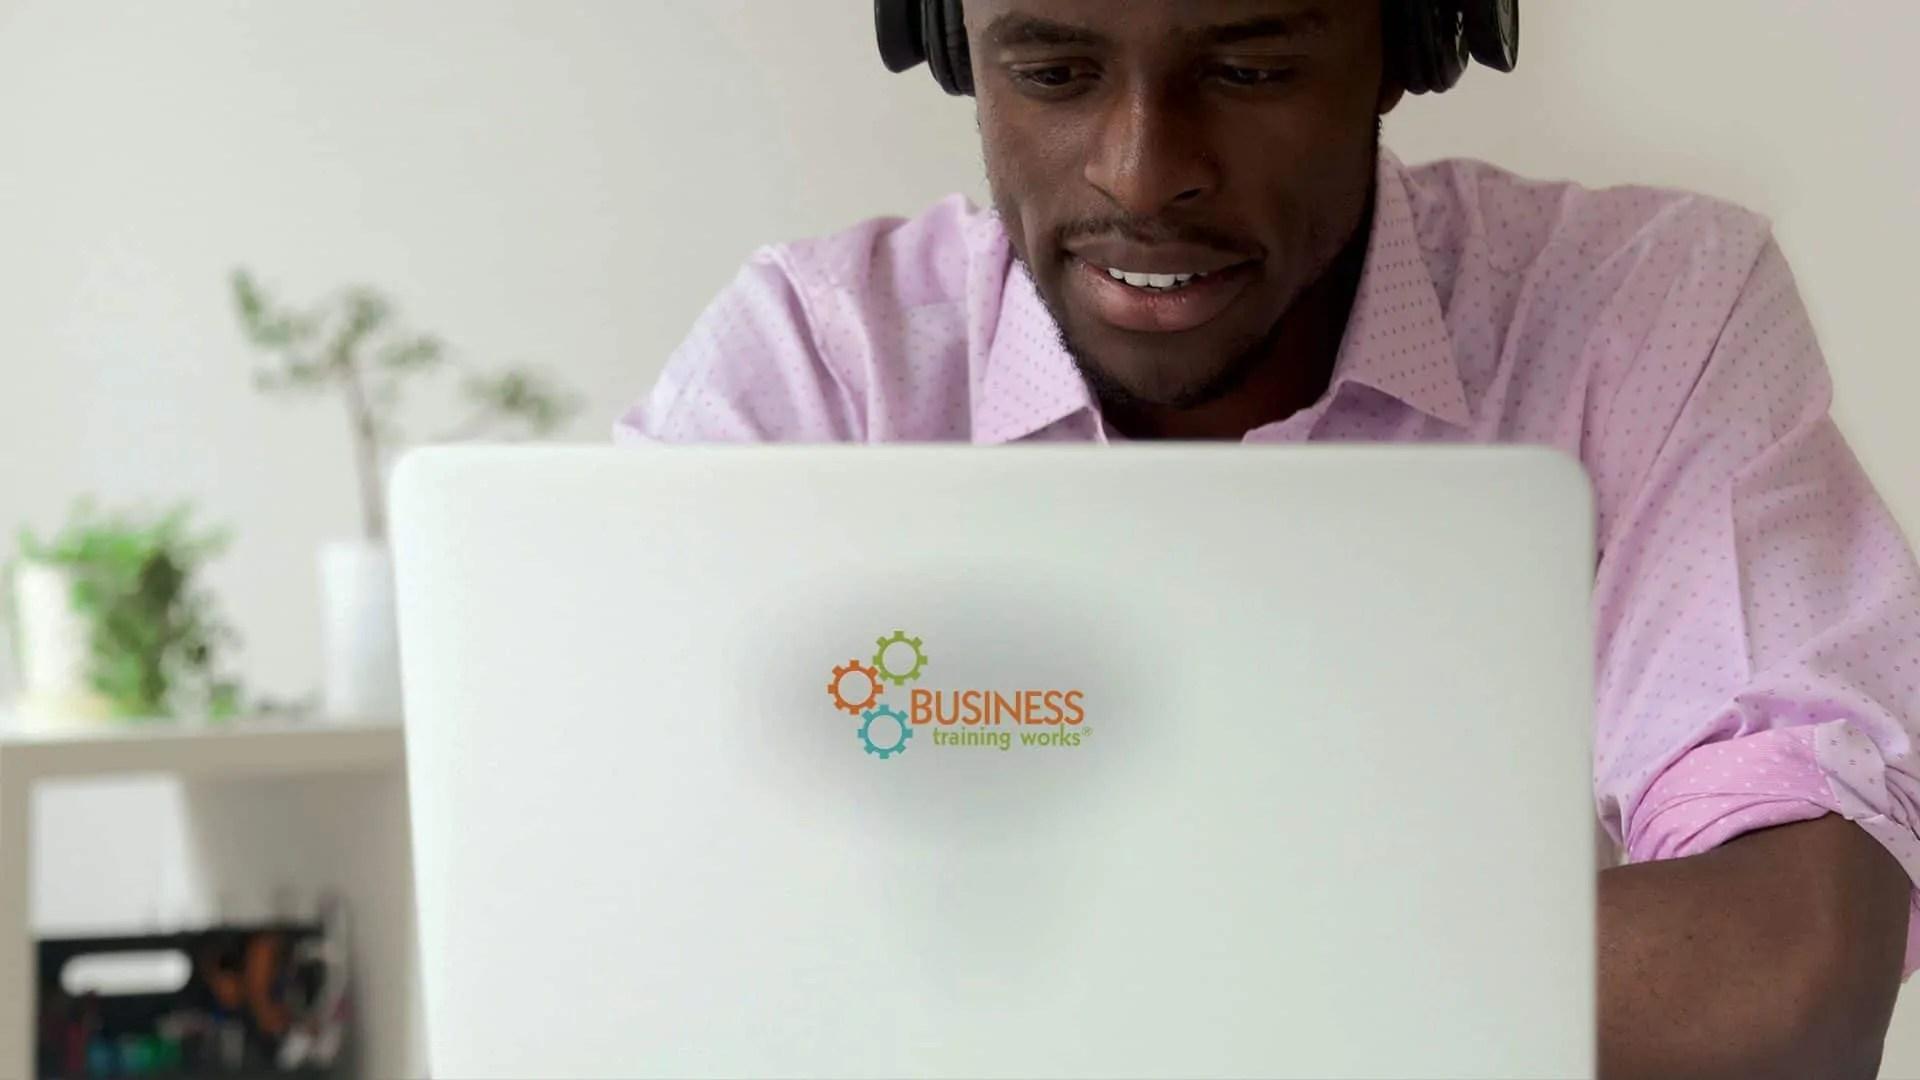 Web-Based Business Writing Programs